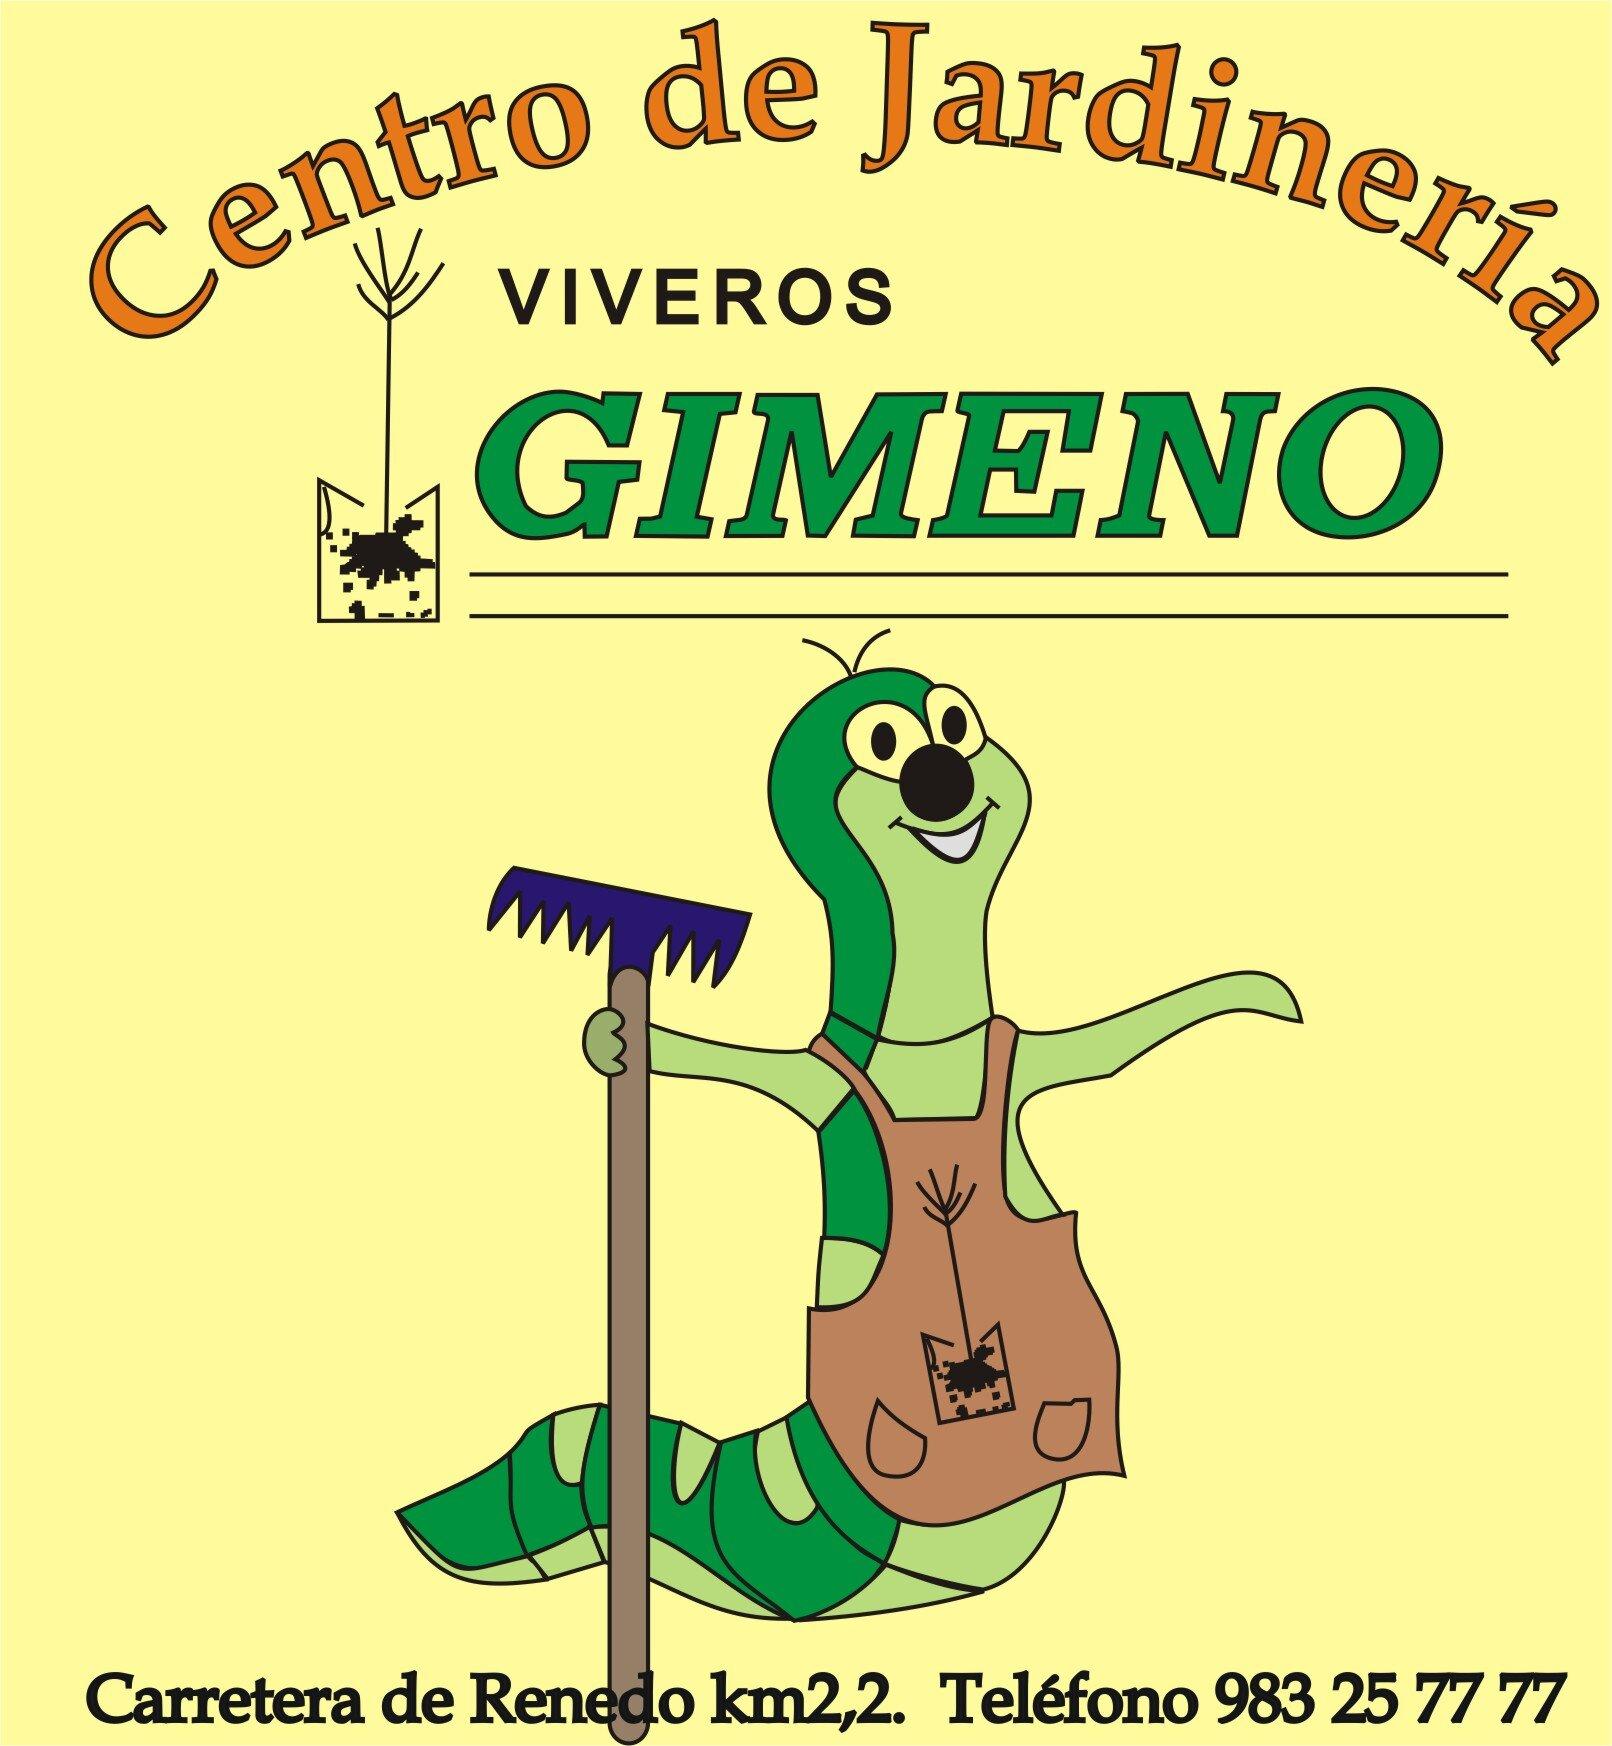 Charming C.J.Viveros Gimeno